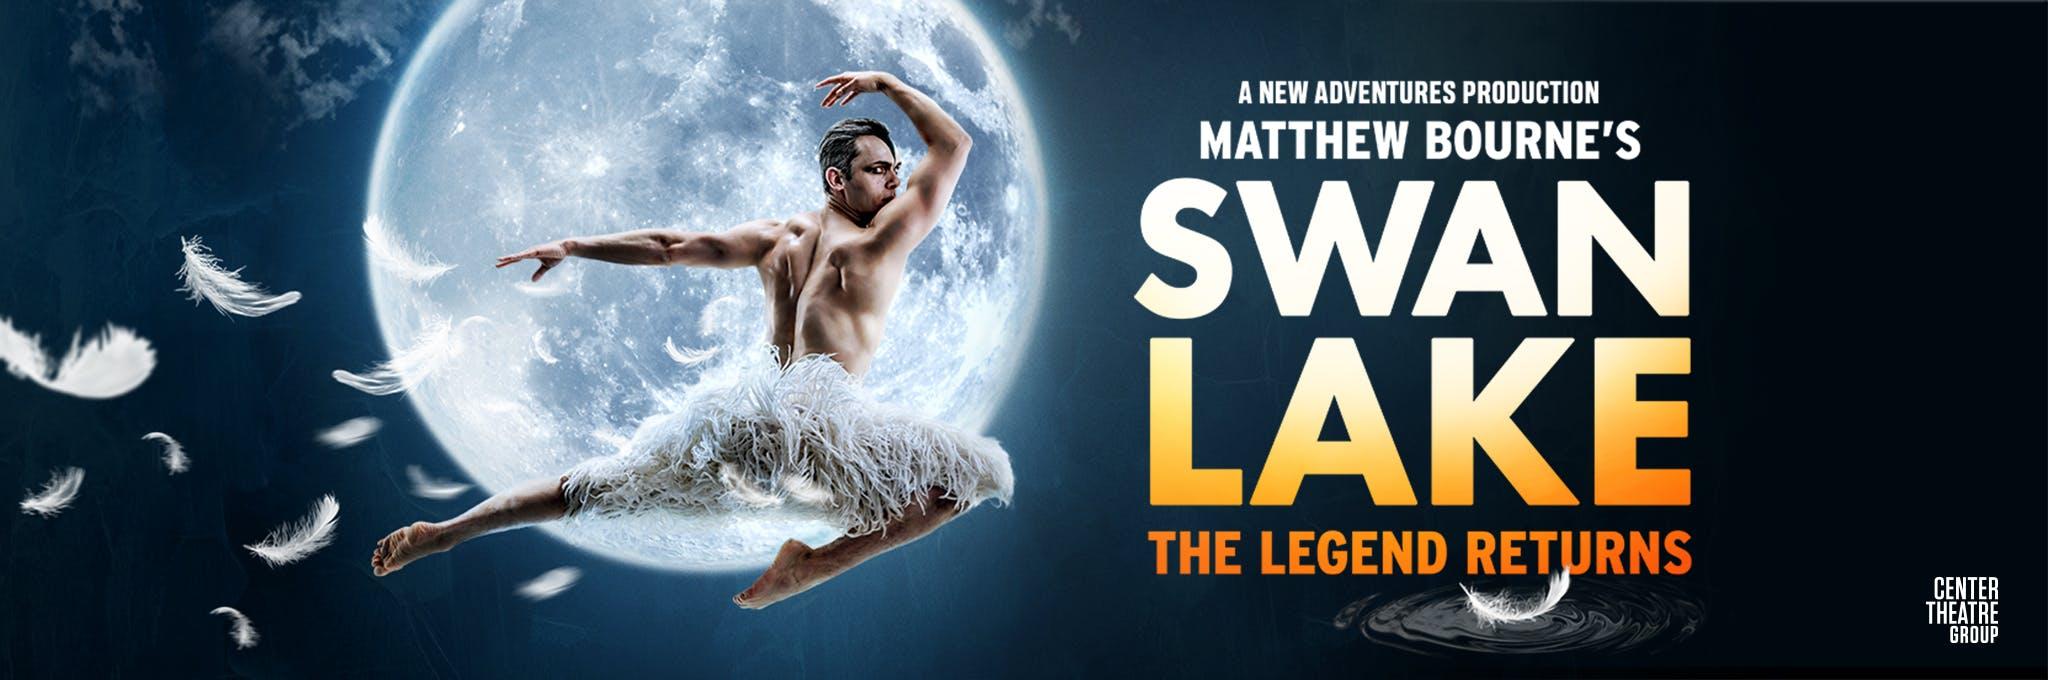 Matthew Bourne's Swan Lake Logo